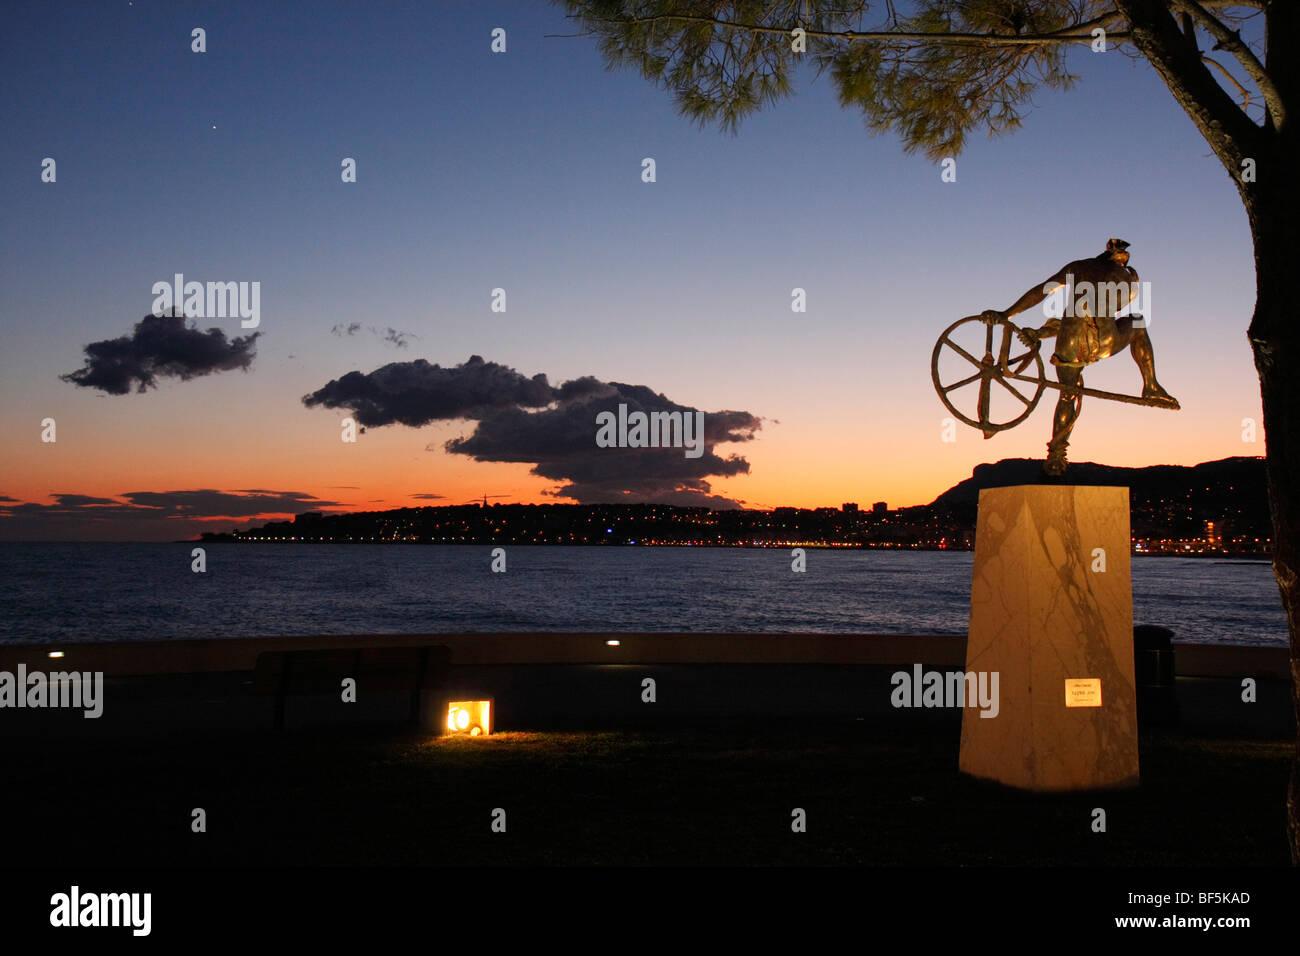 Cap Martin, Menton, Alpes Maritimes, Cote d'Azur, France, Europe - Stock Image